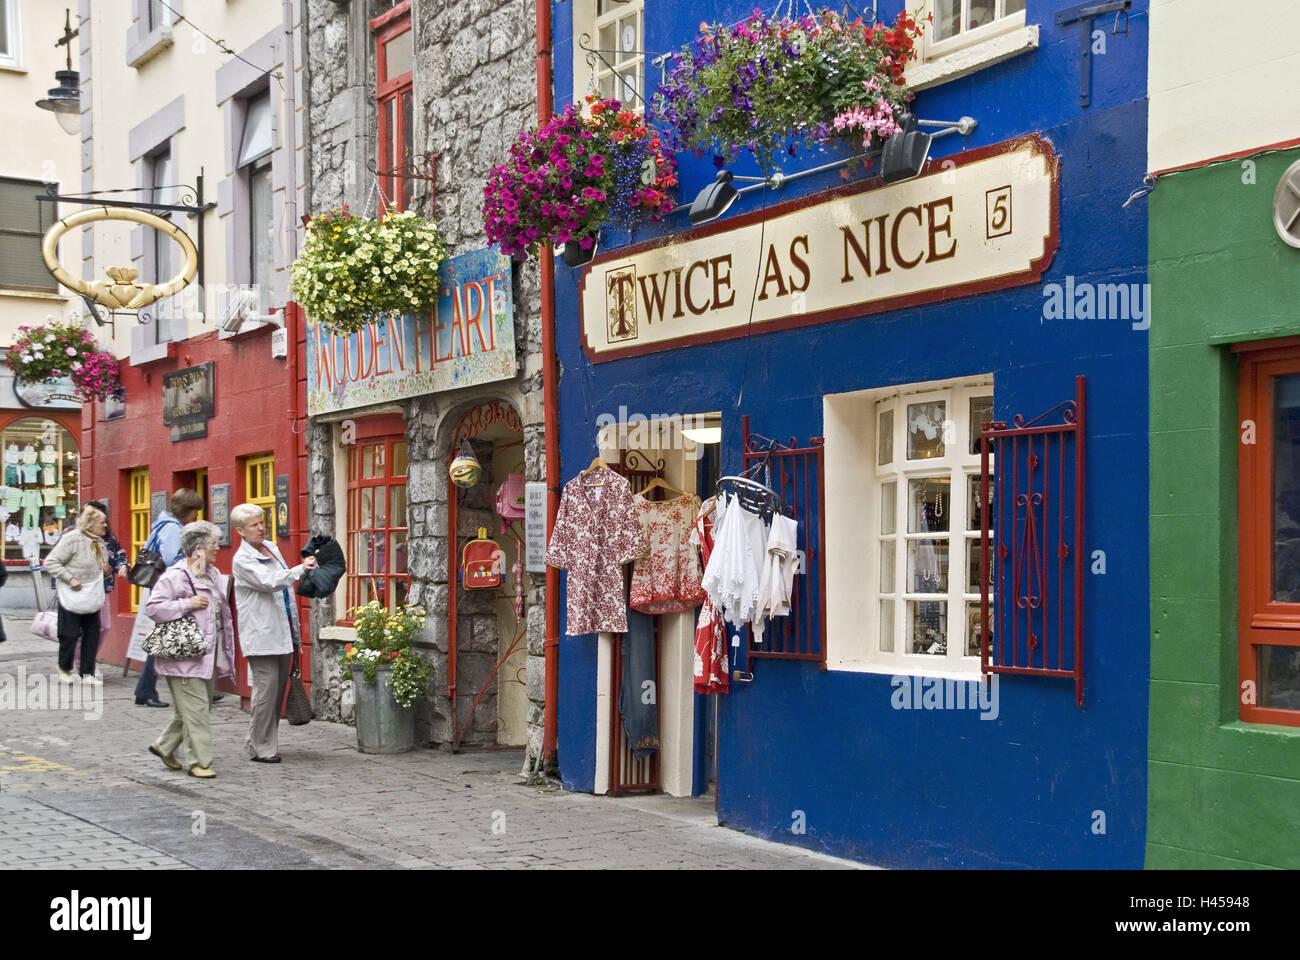 Au Pair wanted in Oldtown, County Dublin - Au Pair Ireland